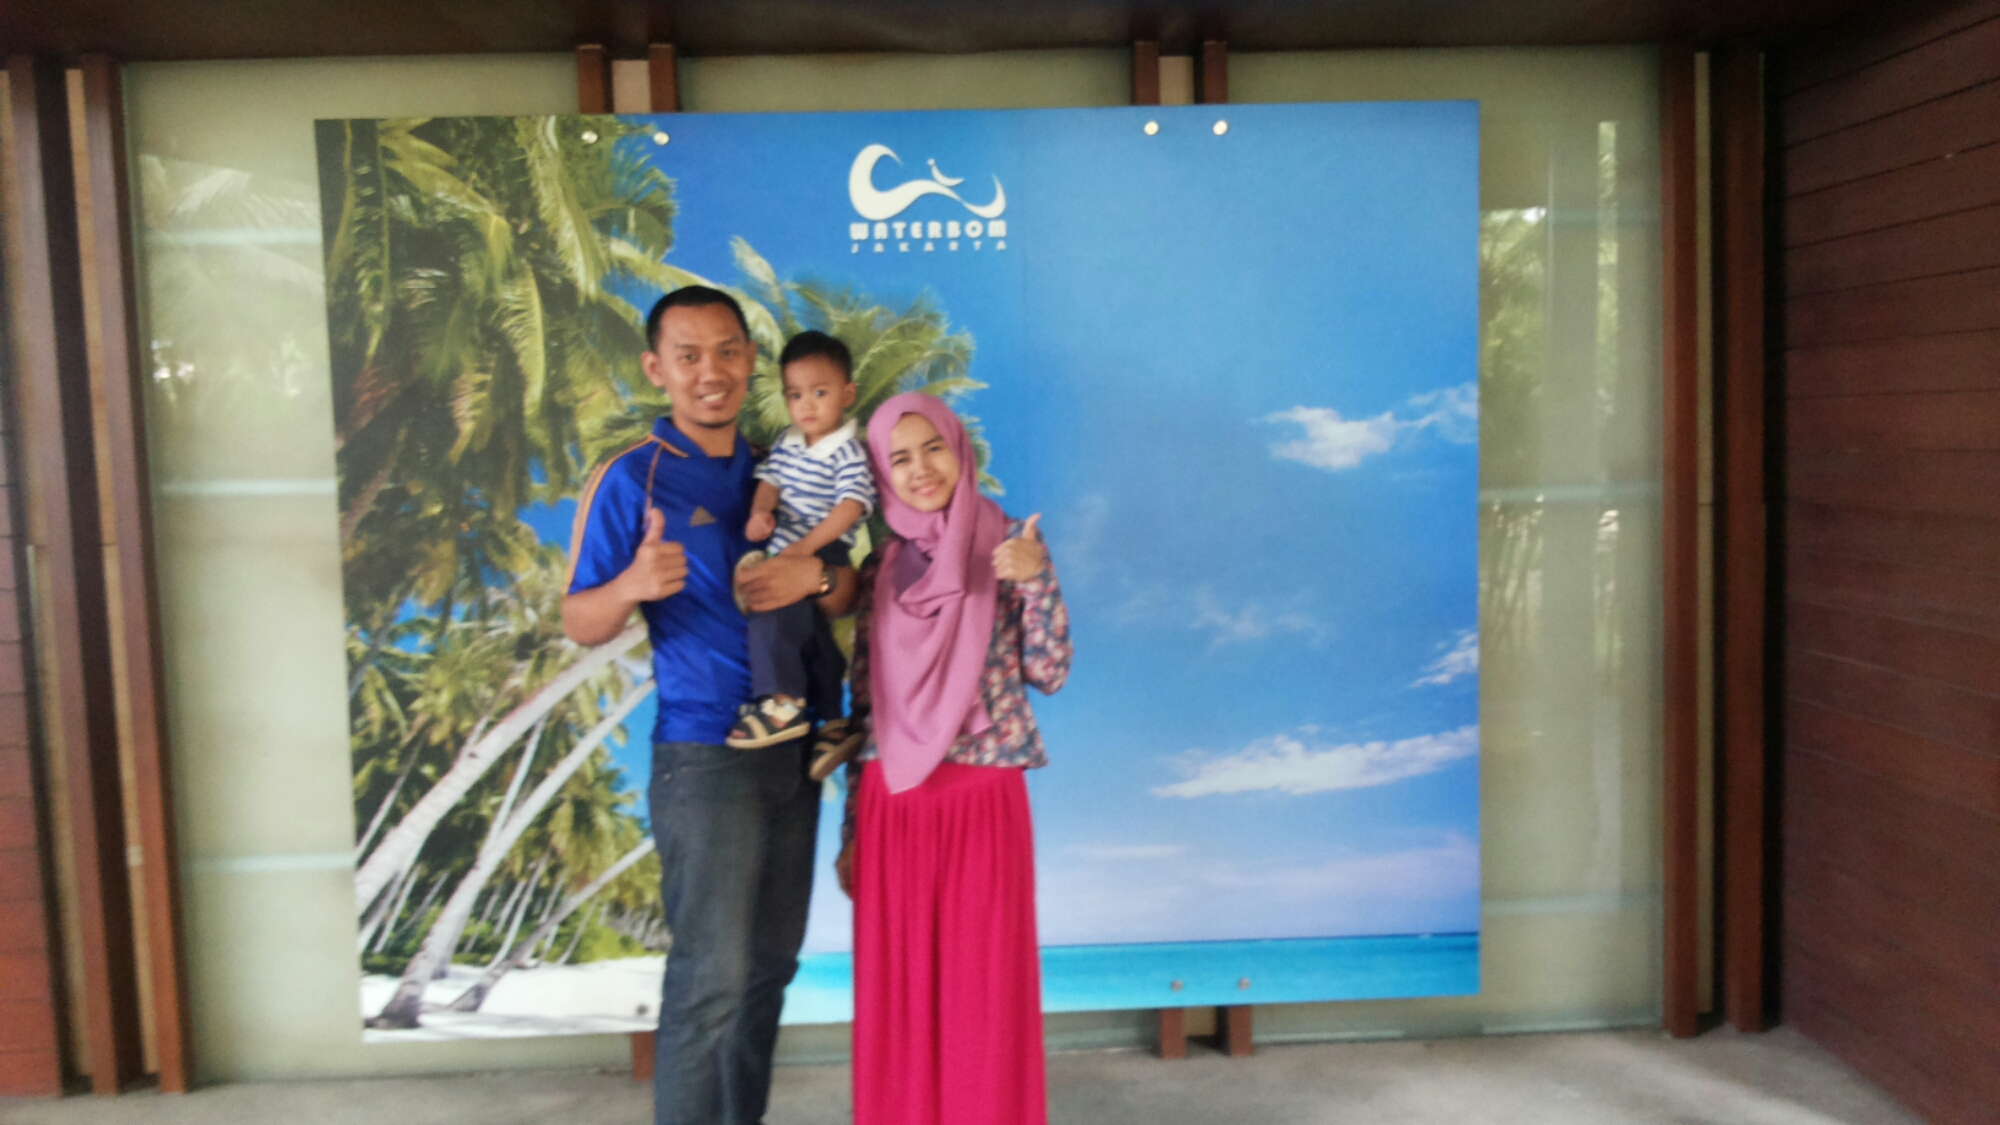 Tempat Jual Waterbom Jakarta Pik Termurah 2018 Samsung Galaxy Note 5 N9208 32 Gb Erafone Garansi Resmi Bundling Tau Telkomsel Pantai Indah Kapuk Image